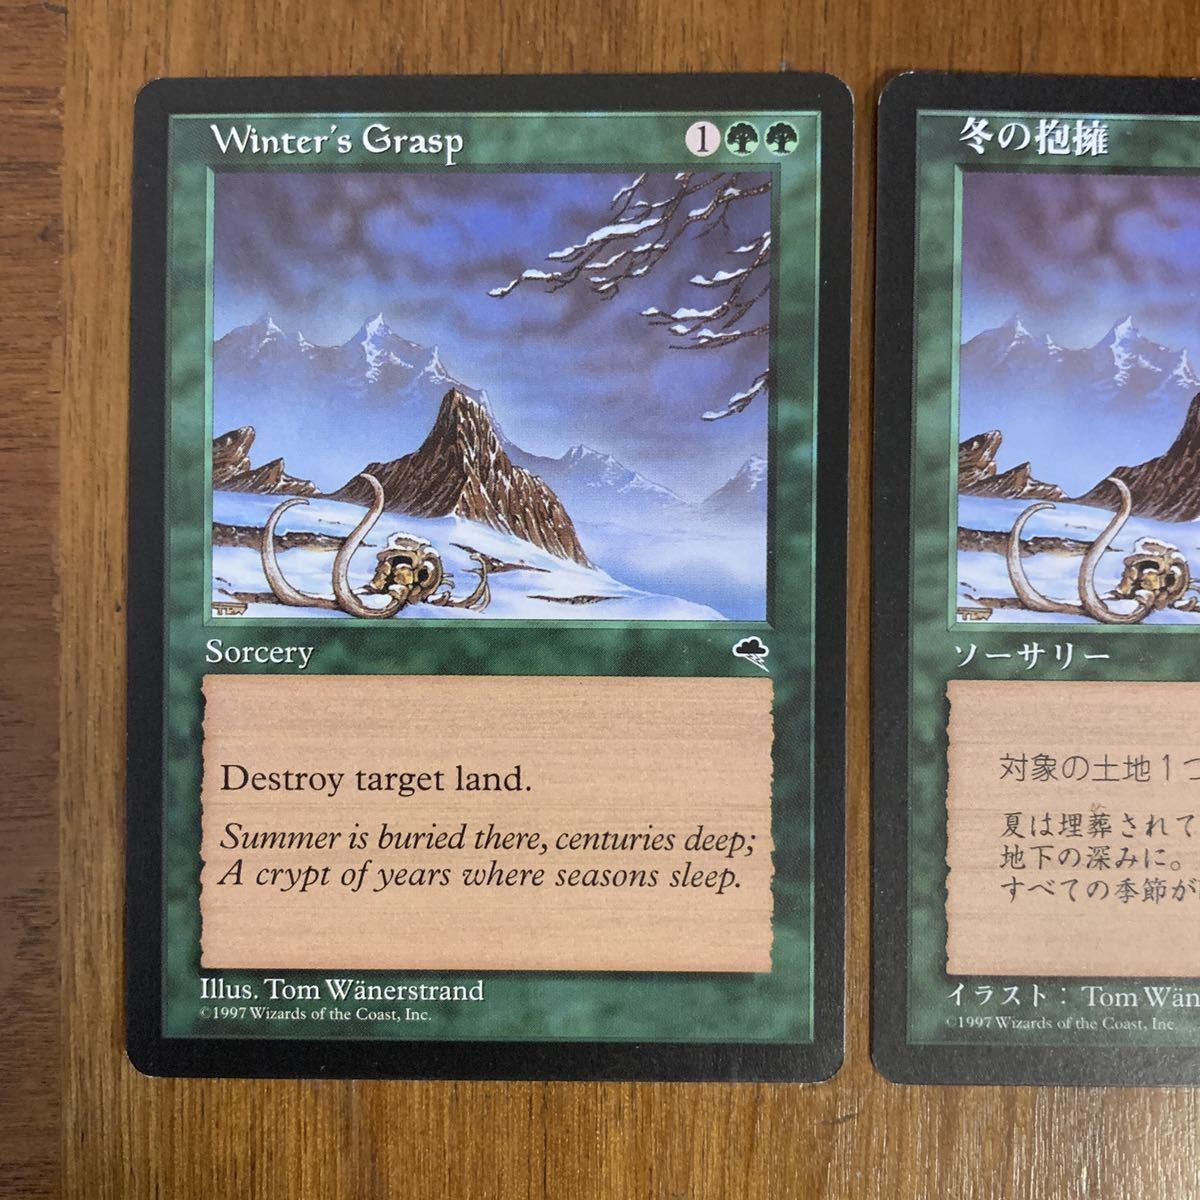 ◆MTG TMP 冬の抱擁 Winter's Grasp 日本語1枚・英語1枚_画像3